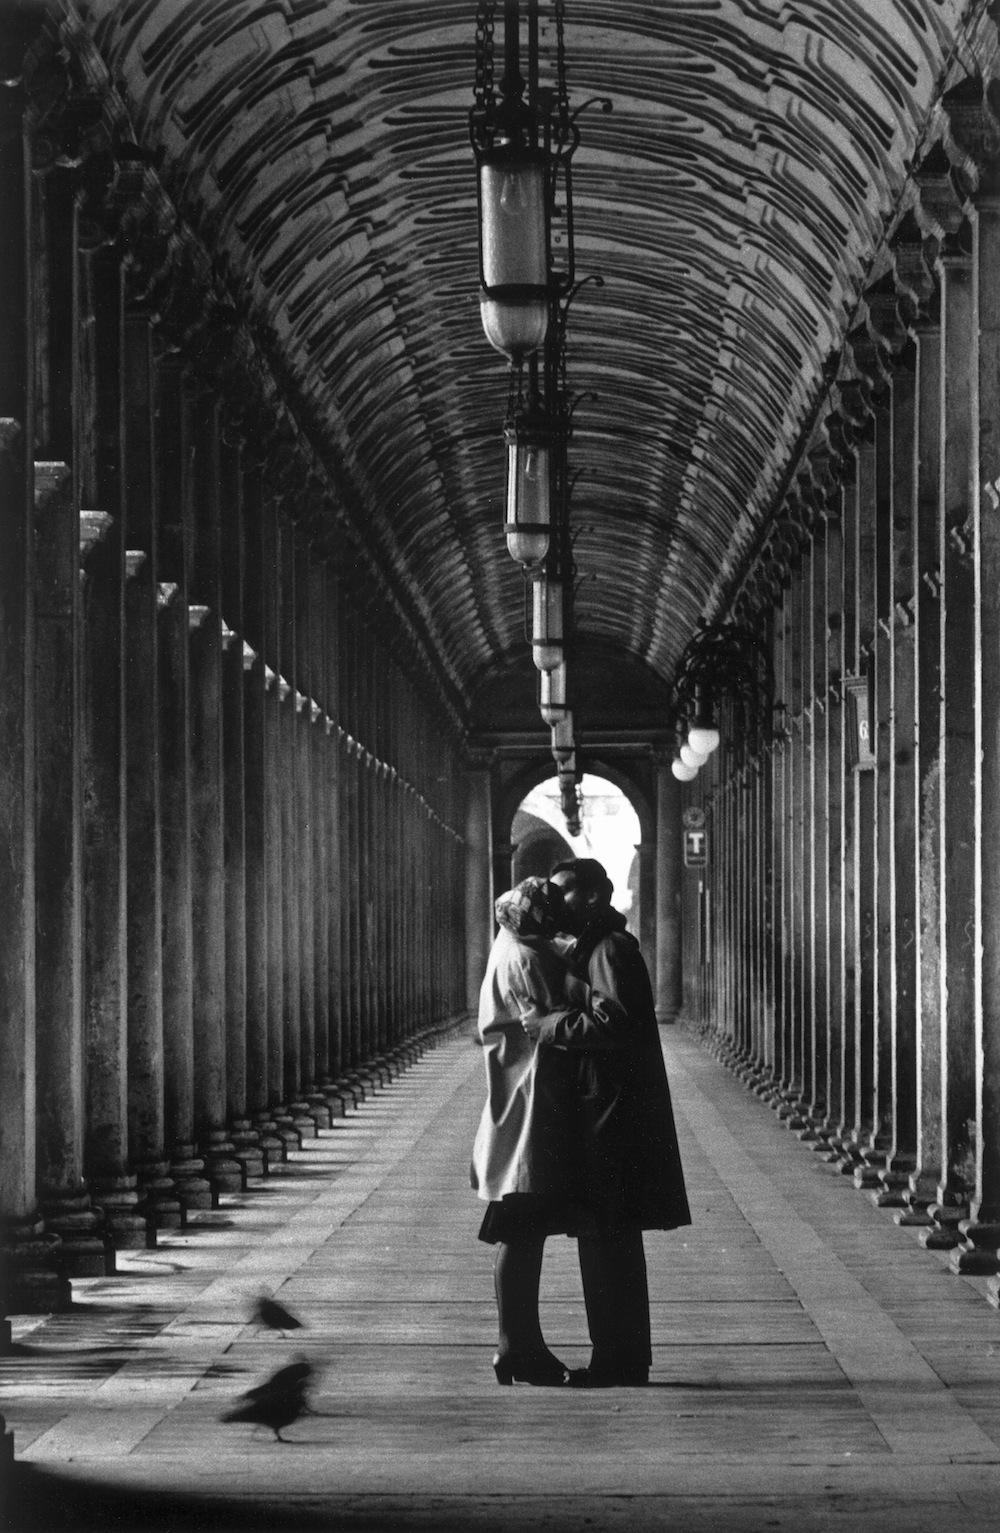 Venezia 1959 Piazza San Marco